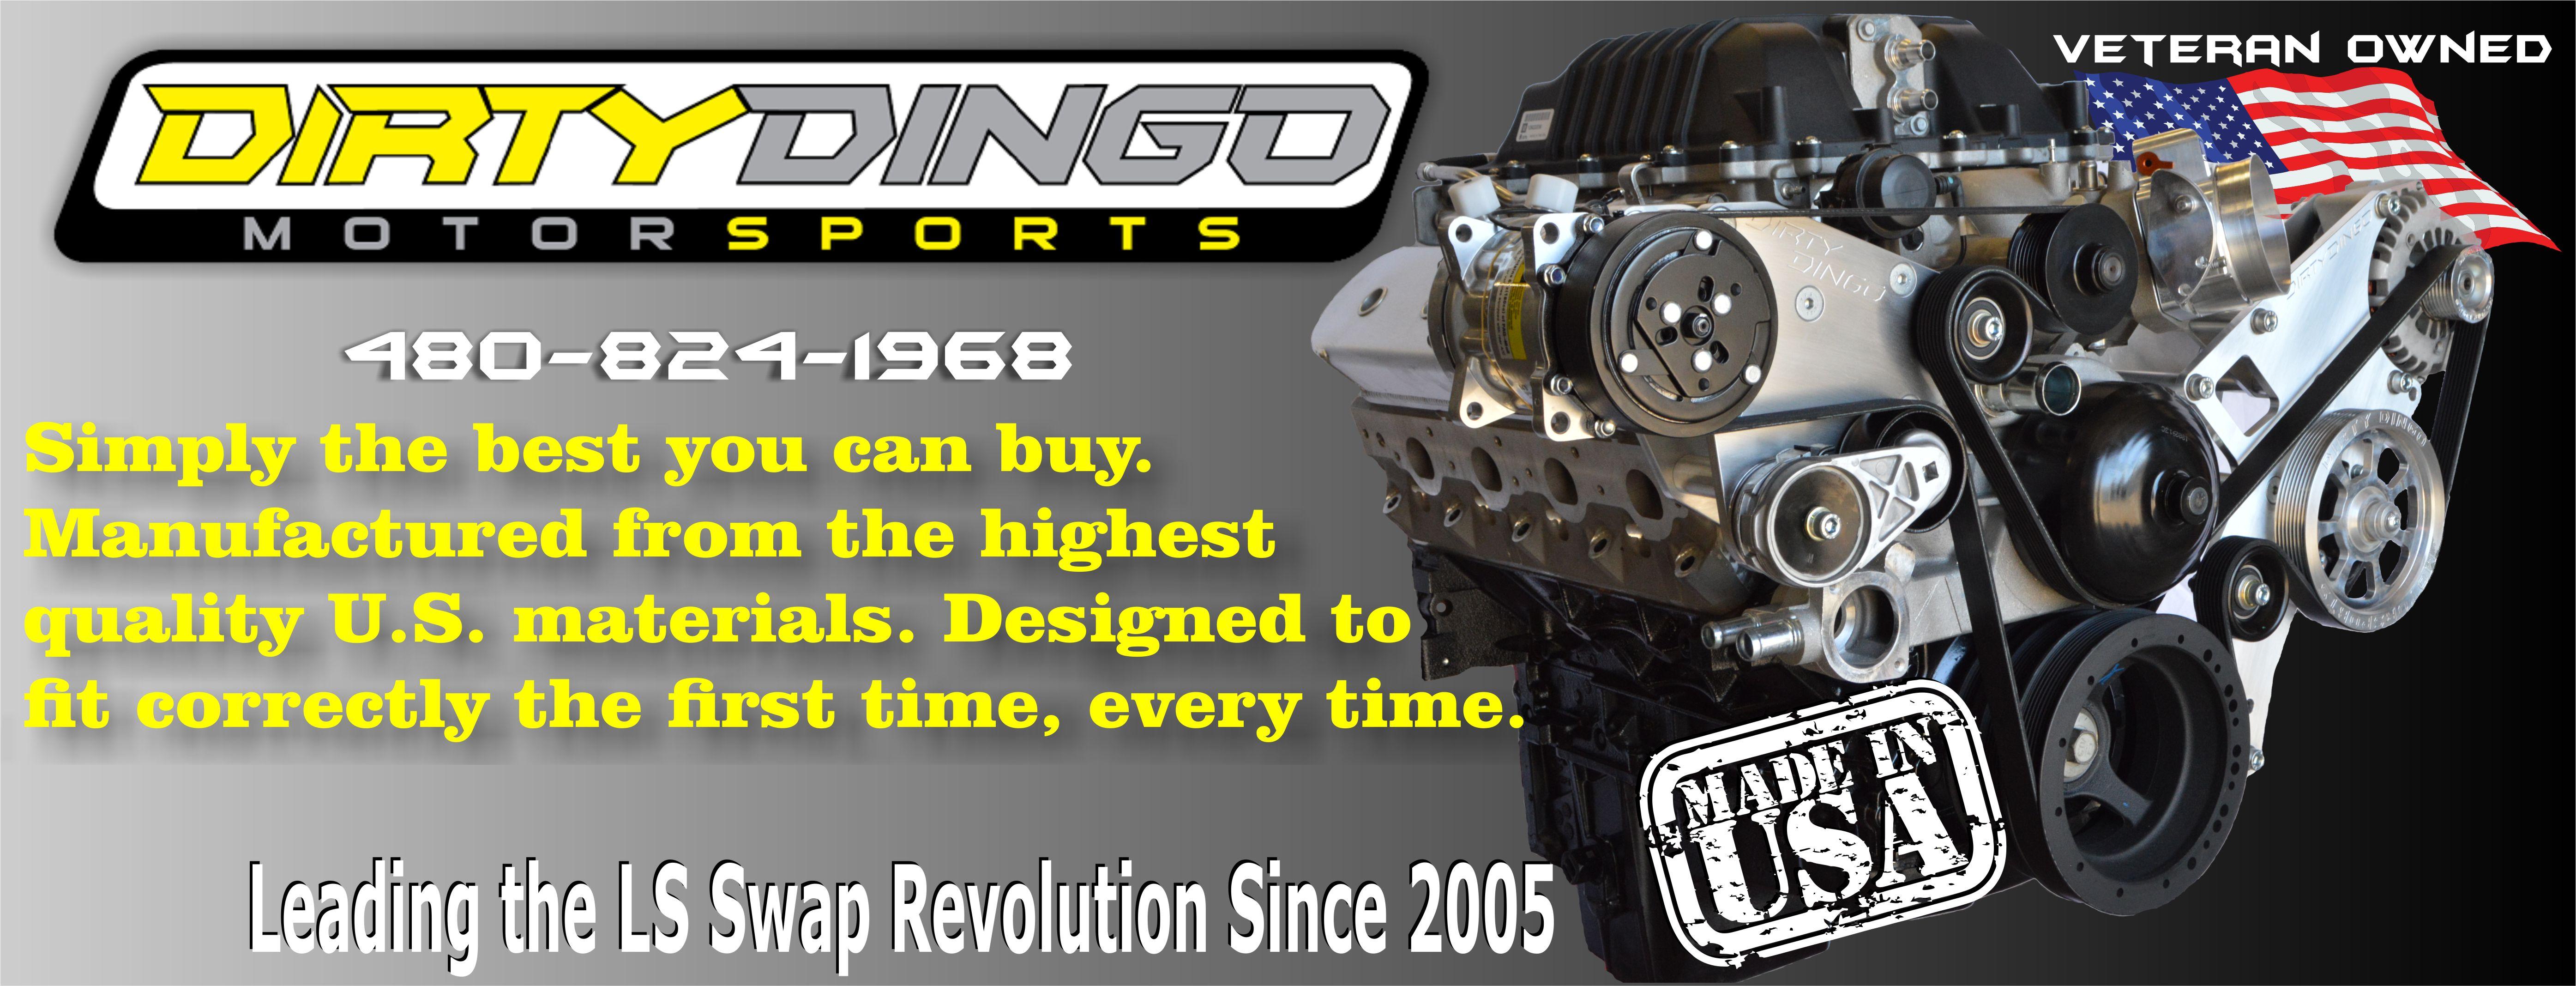 Dirty Dingo Motorsports Gm Ls Gen 3 Ls1 4 Conversion Swap Engine 98 Chevy Vortec Mounts And Accessory Brackets